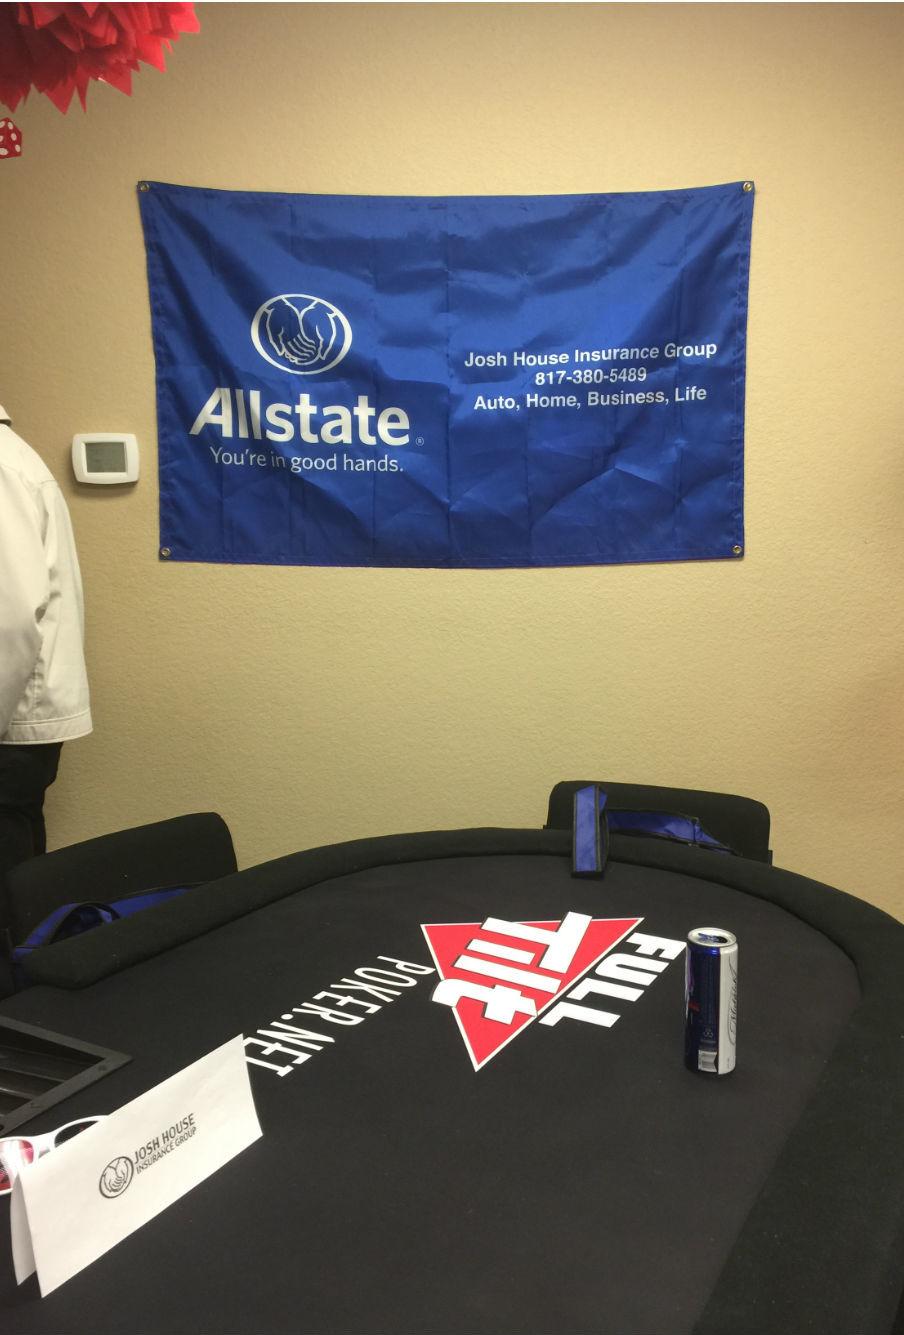 Josh House: Allstate Insurance image 11